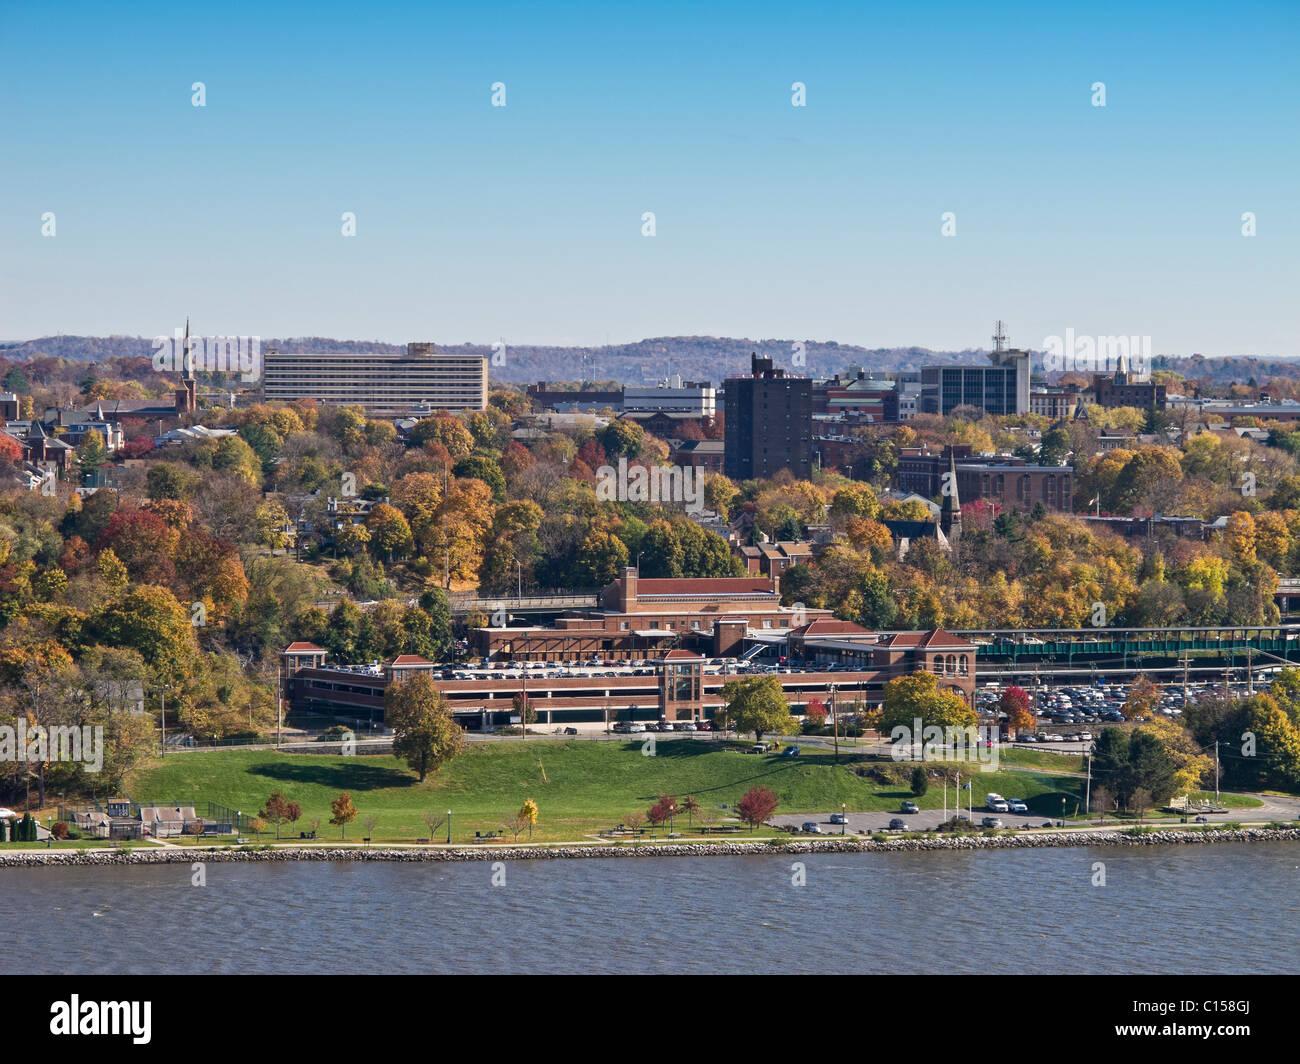 Exterior: City Of Poughkeepsie, NY Along Hudson River Showing Metro